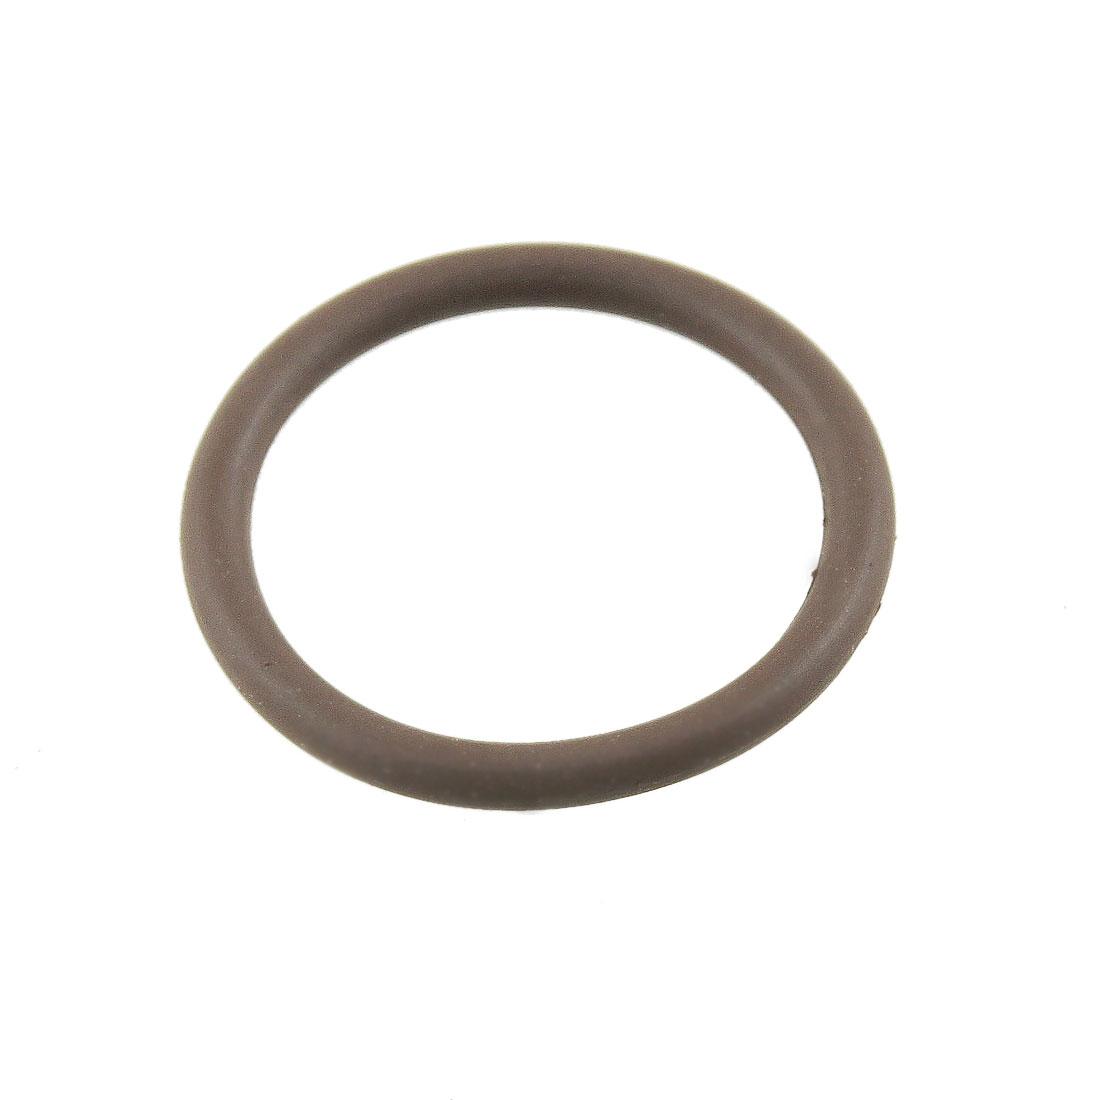 21mm x 17mm x 2mm Fluorine Rubber O Ring Oil Sealing Gasket